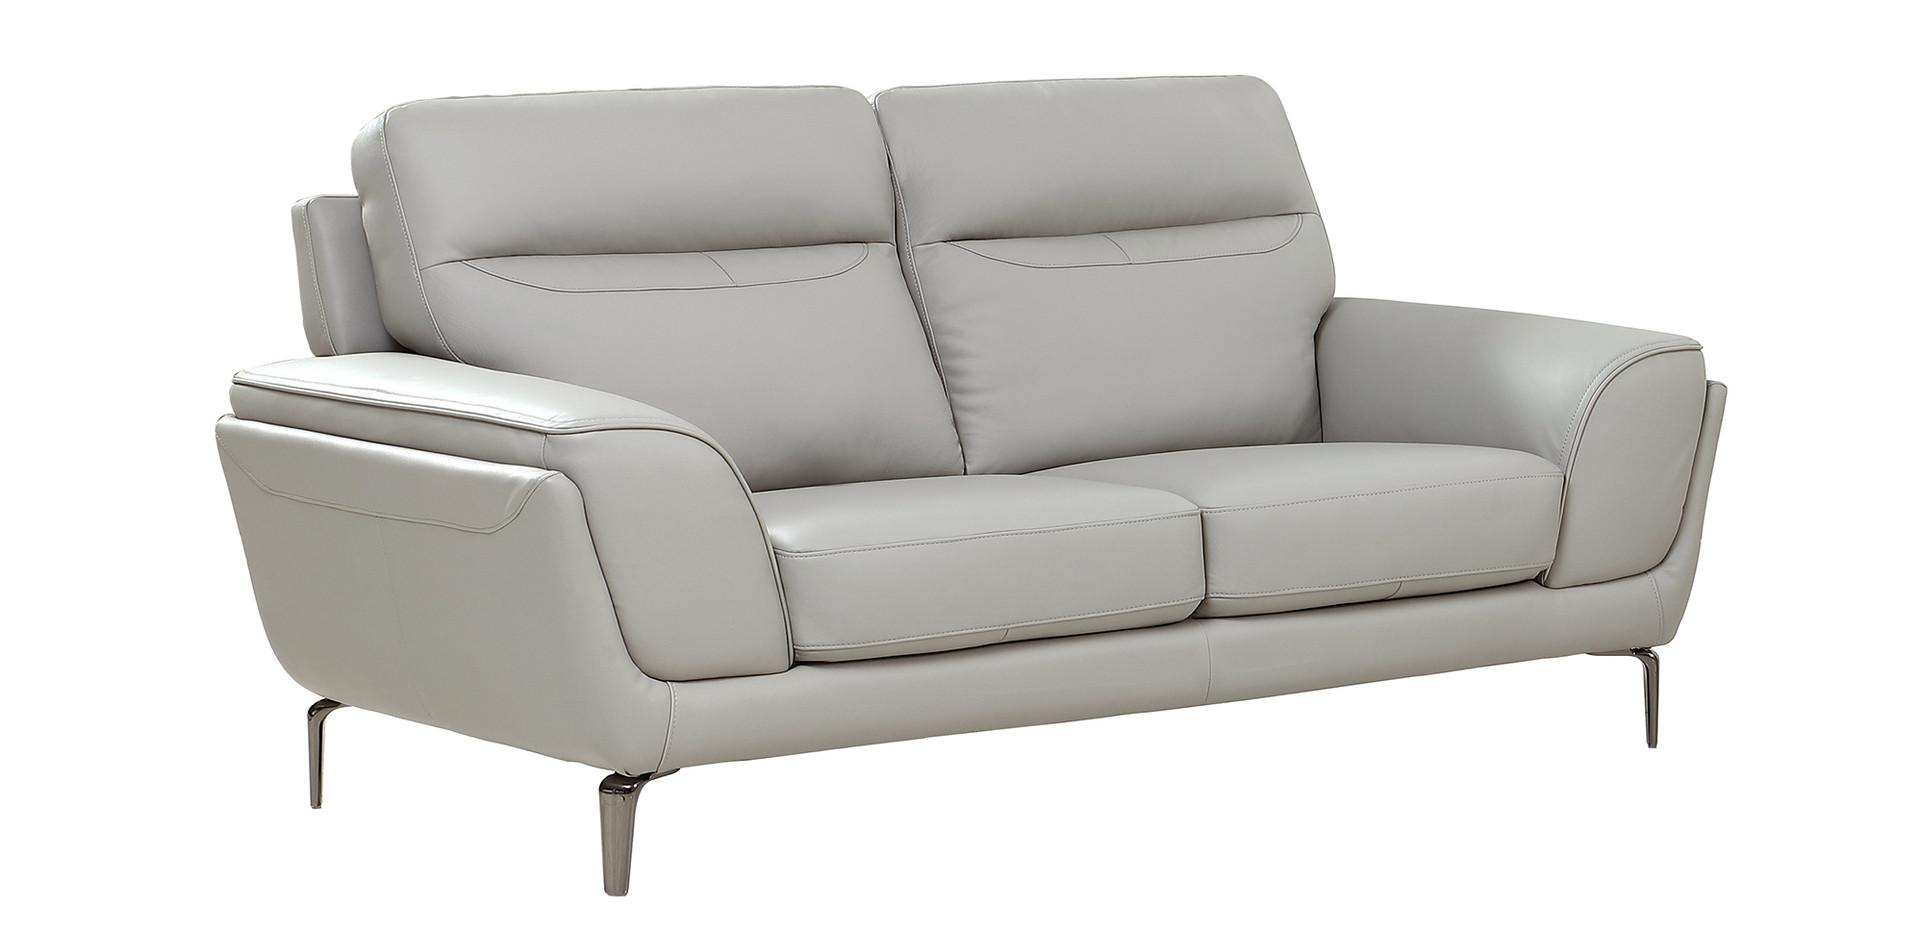 Vitalia 2 Seater - Light Grey.jpg